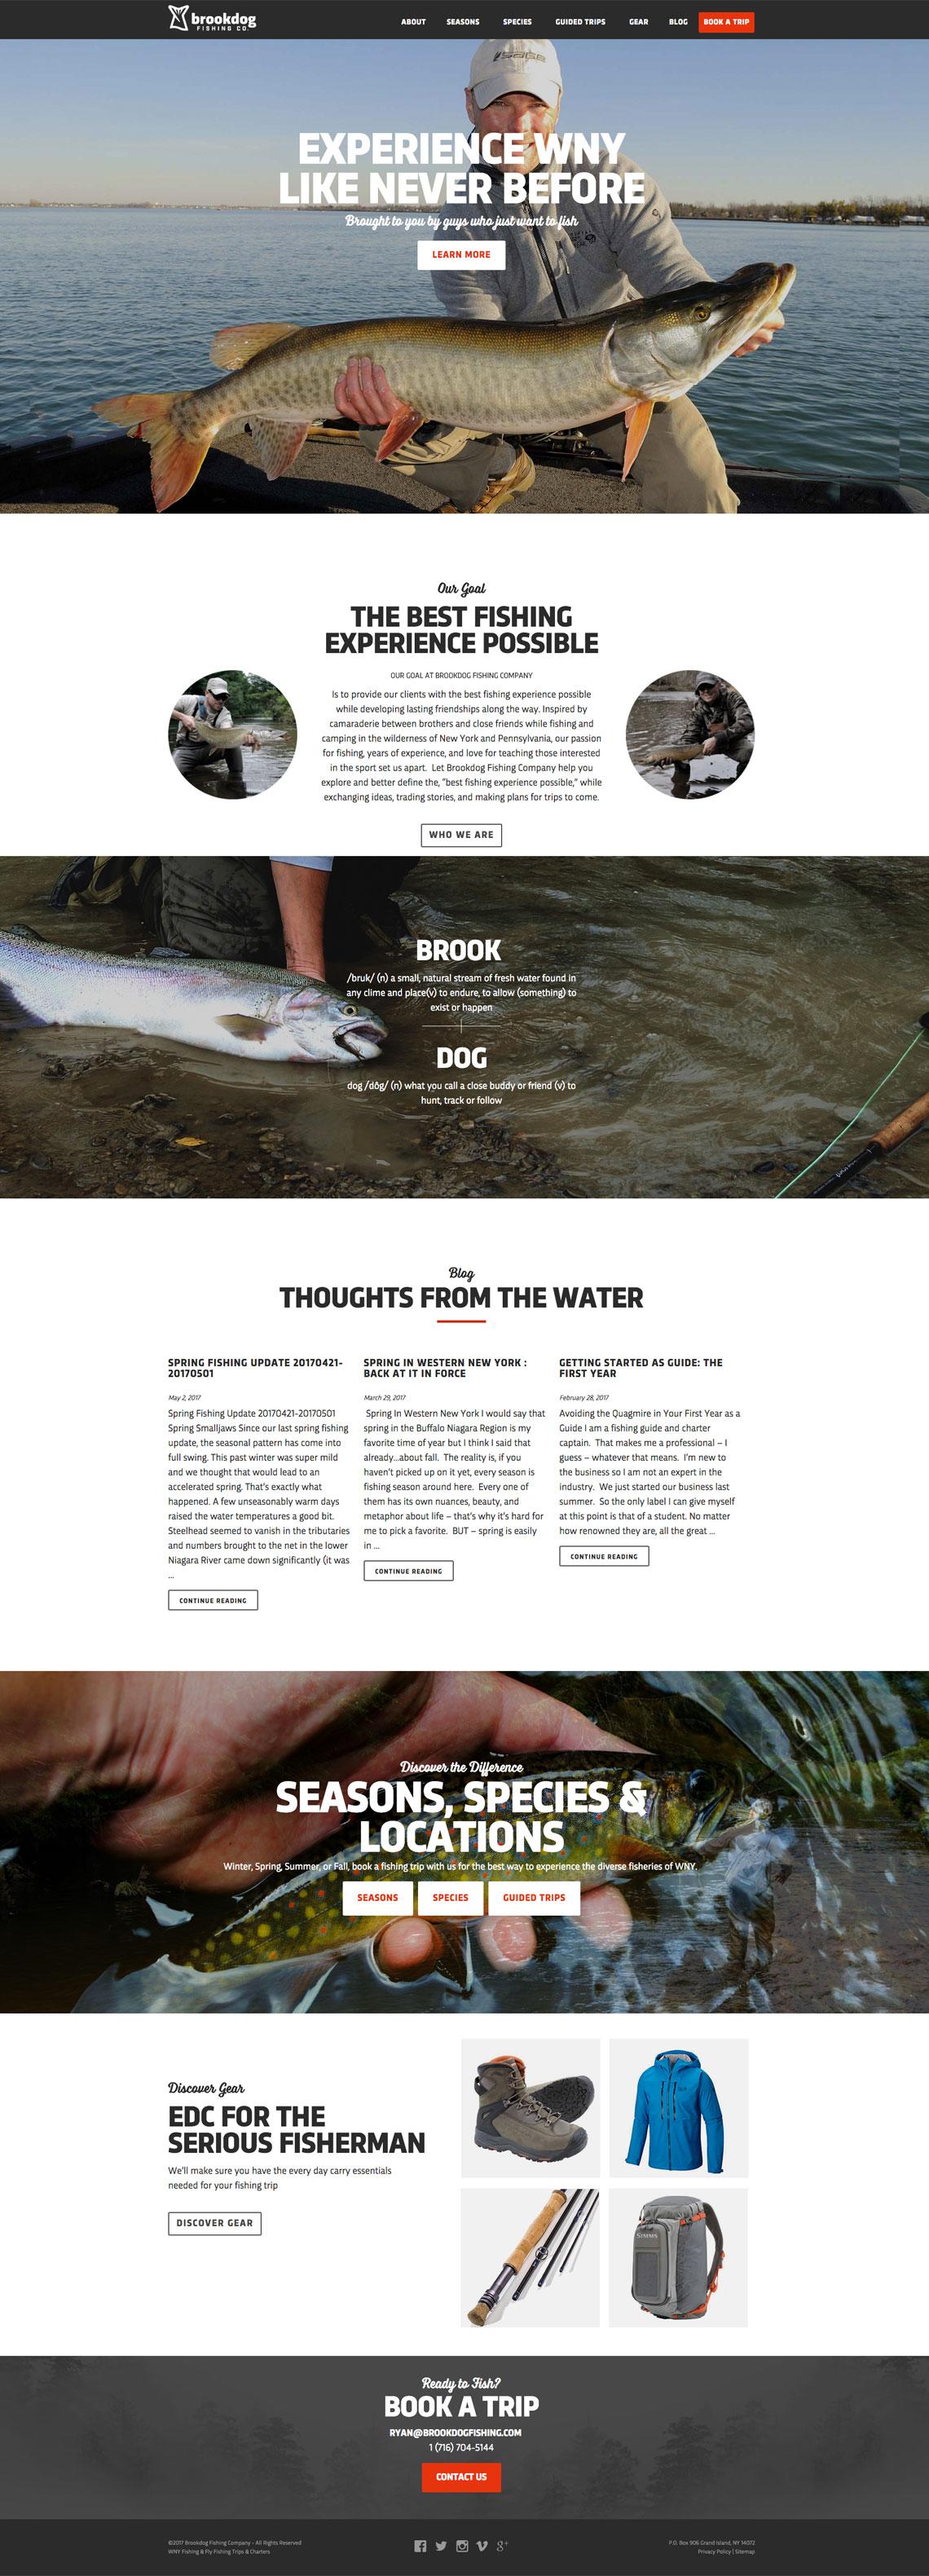 Brookdog Fishing CMS Web Design